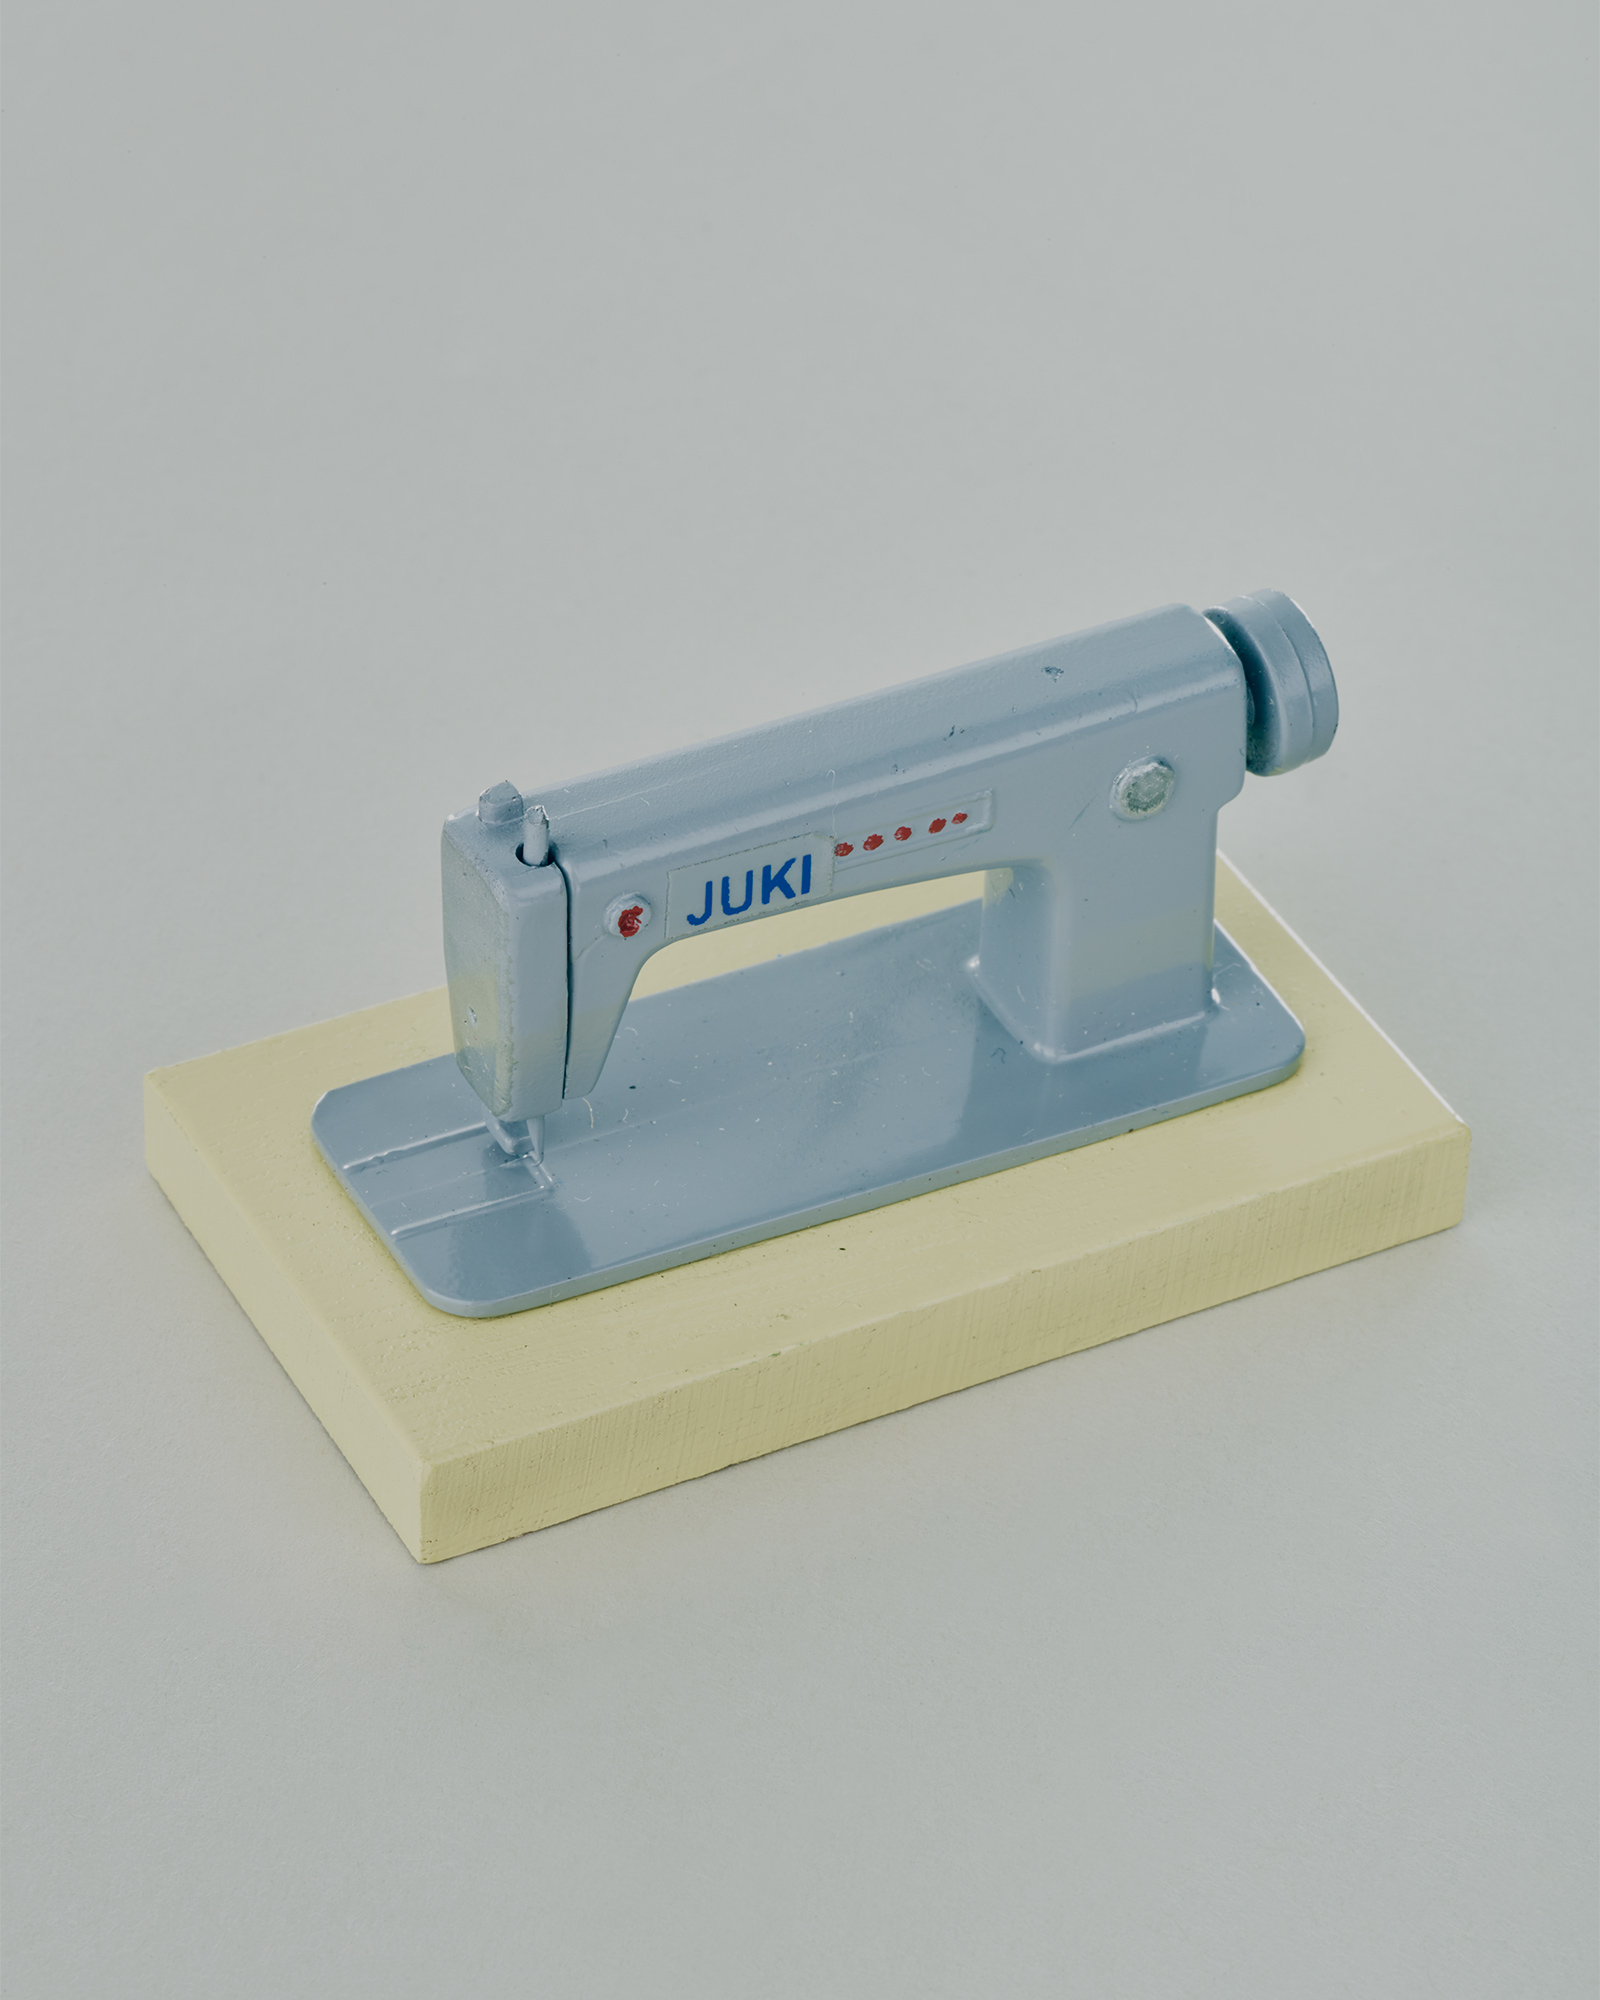 sewing machine toy